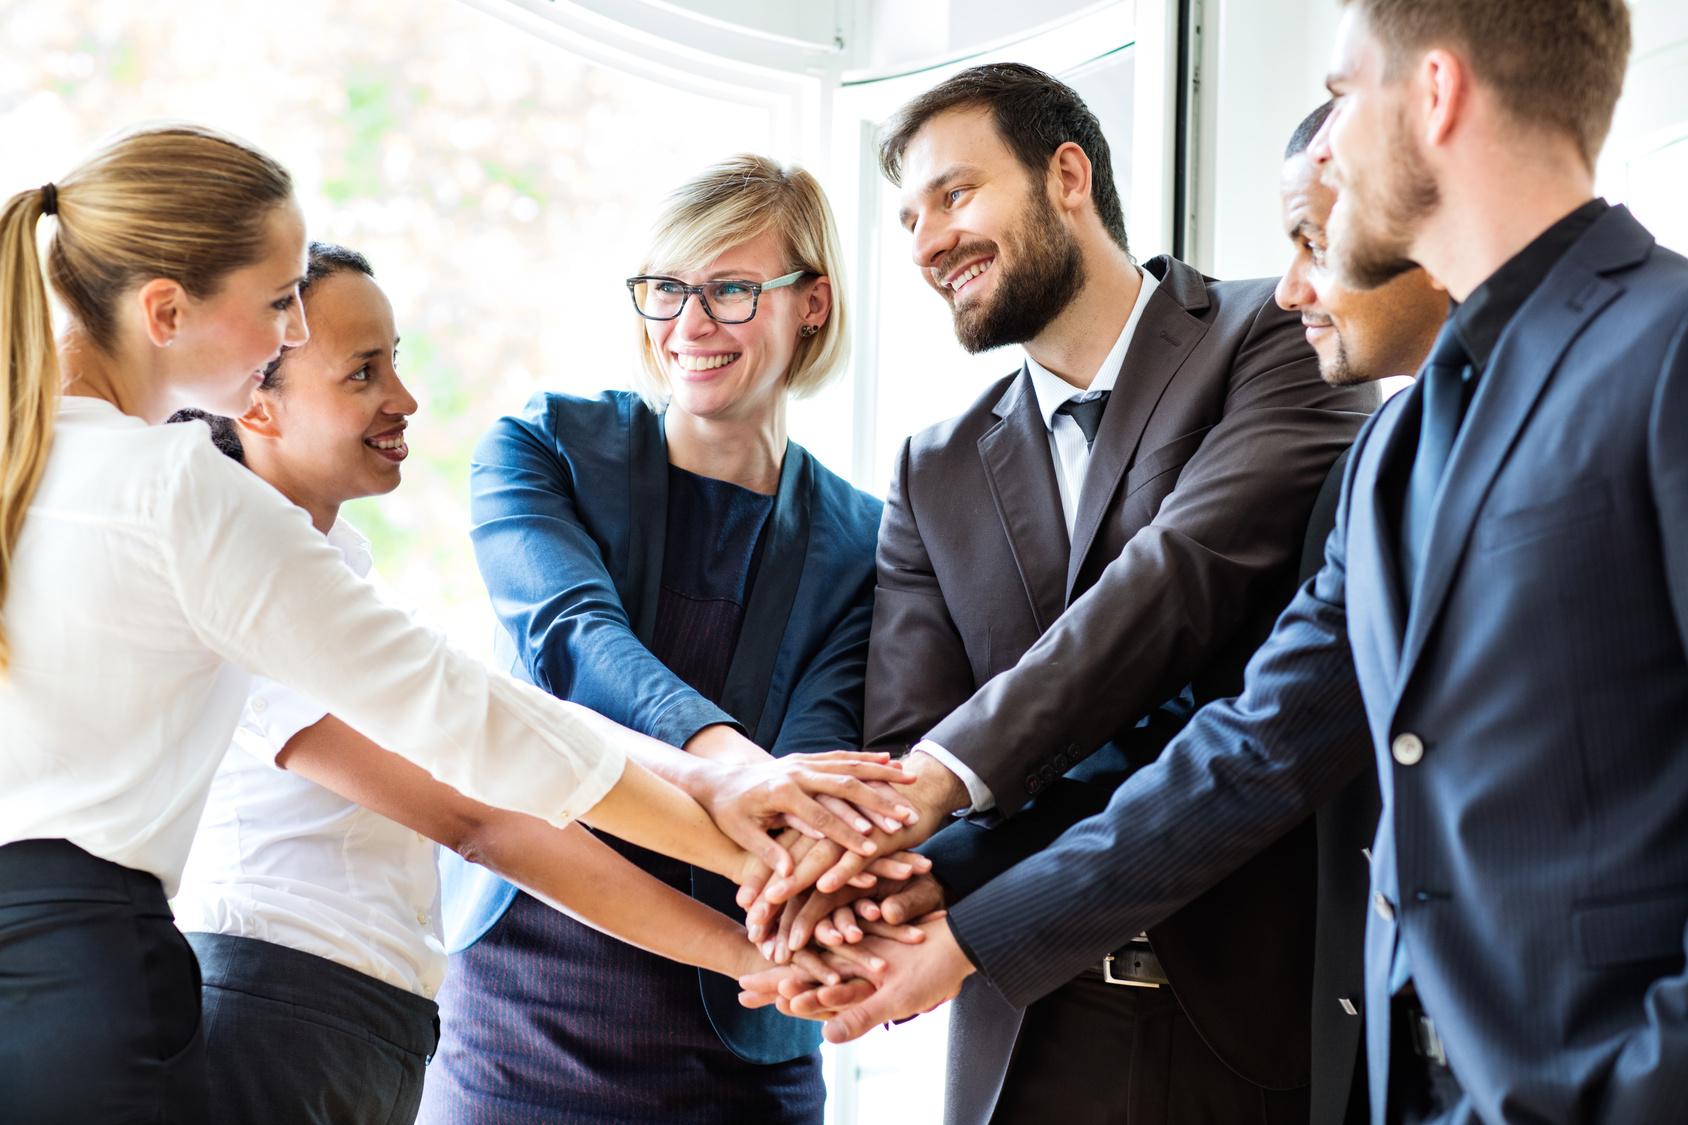 Teamwork teambuilding entreprise escape game